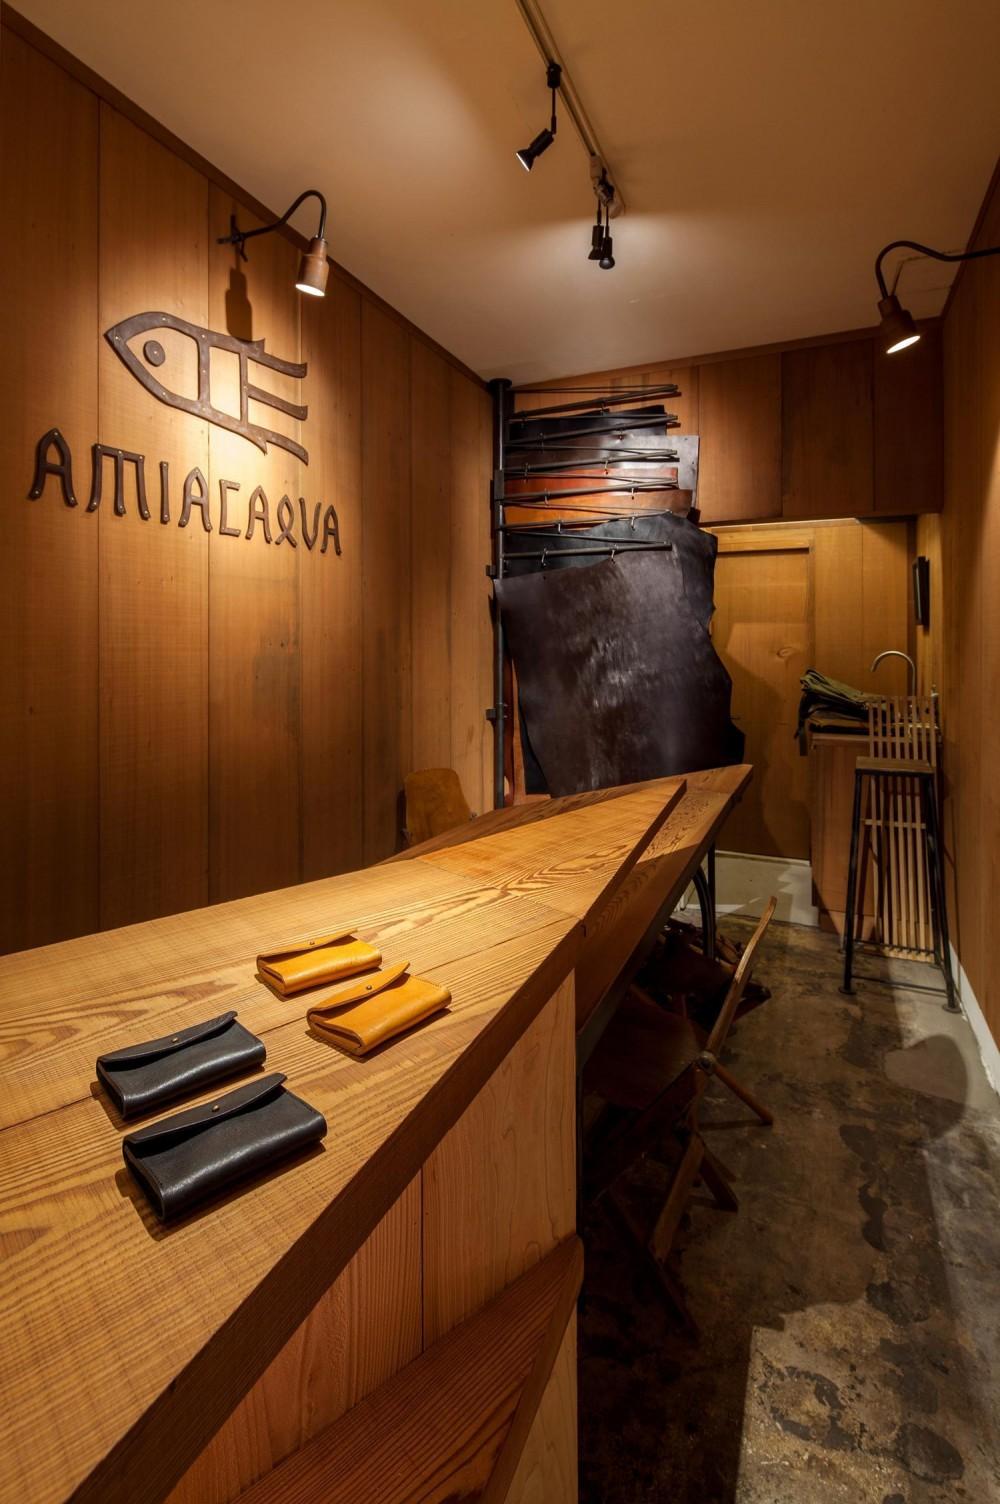 AMIACALVA (Work Space)